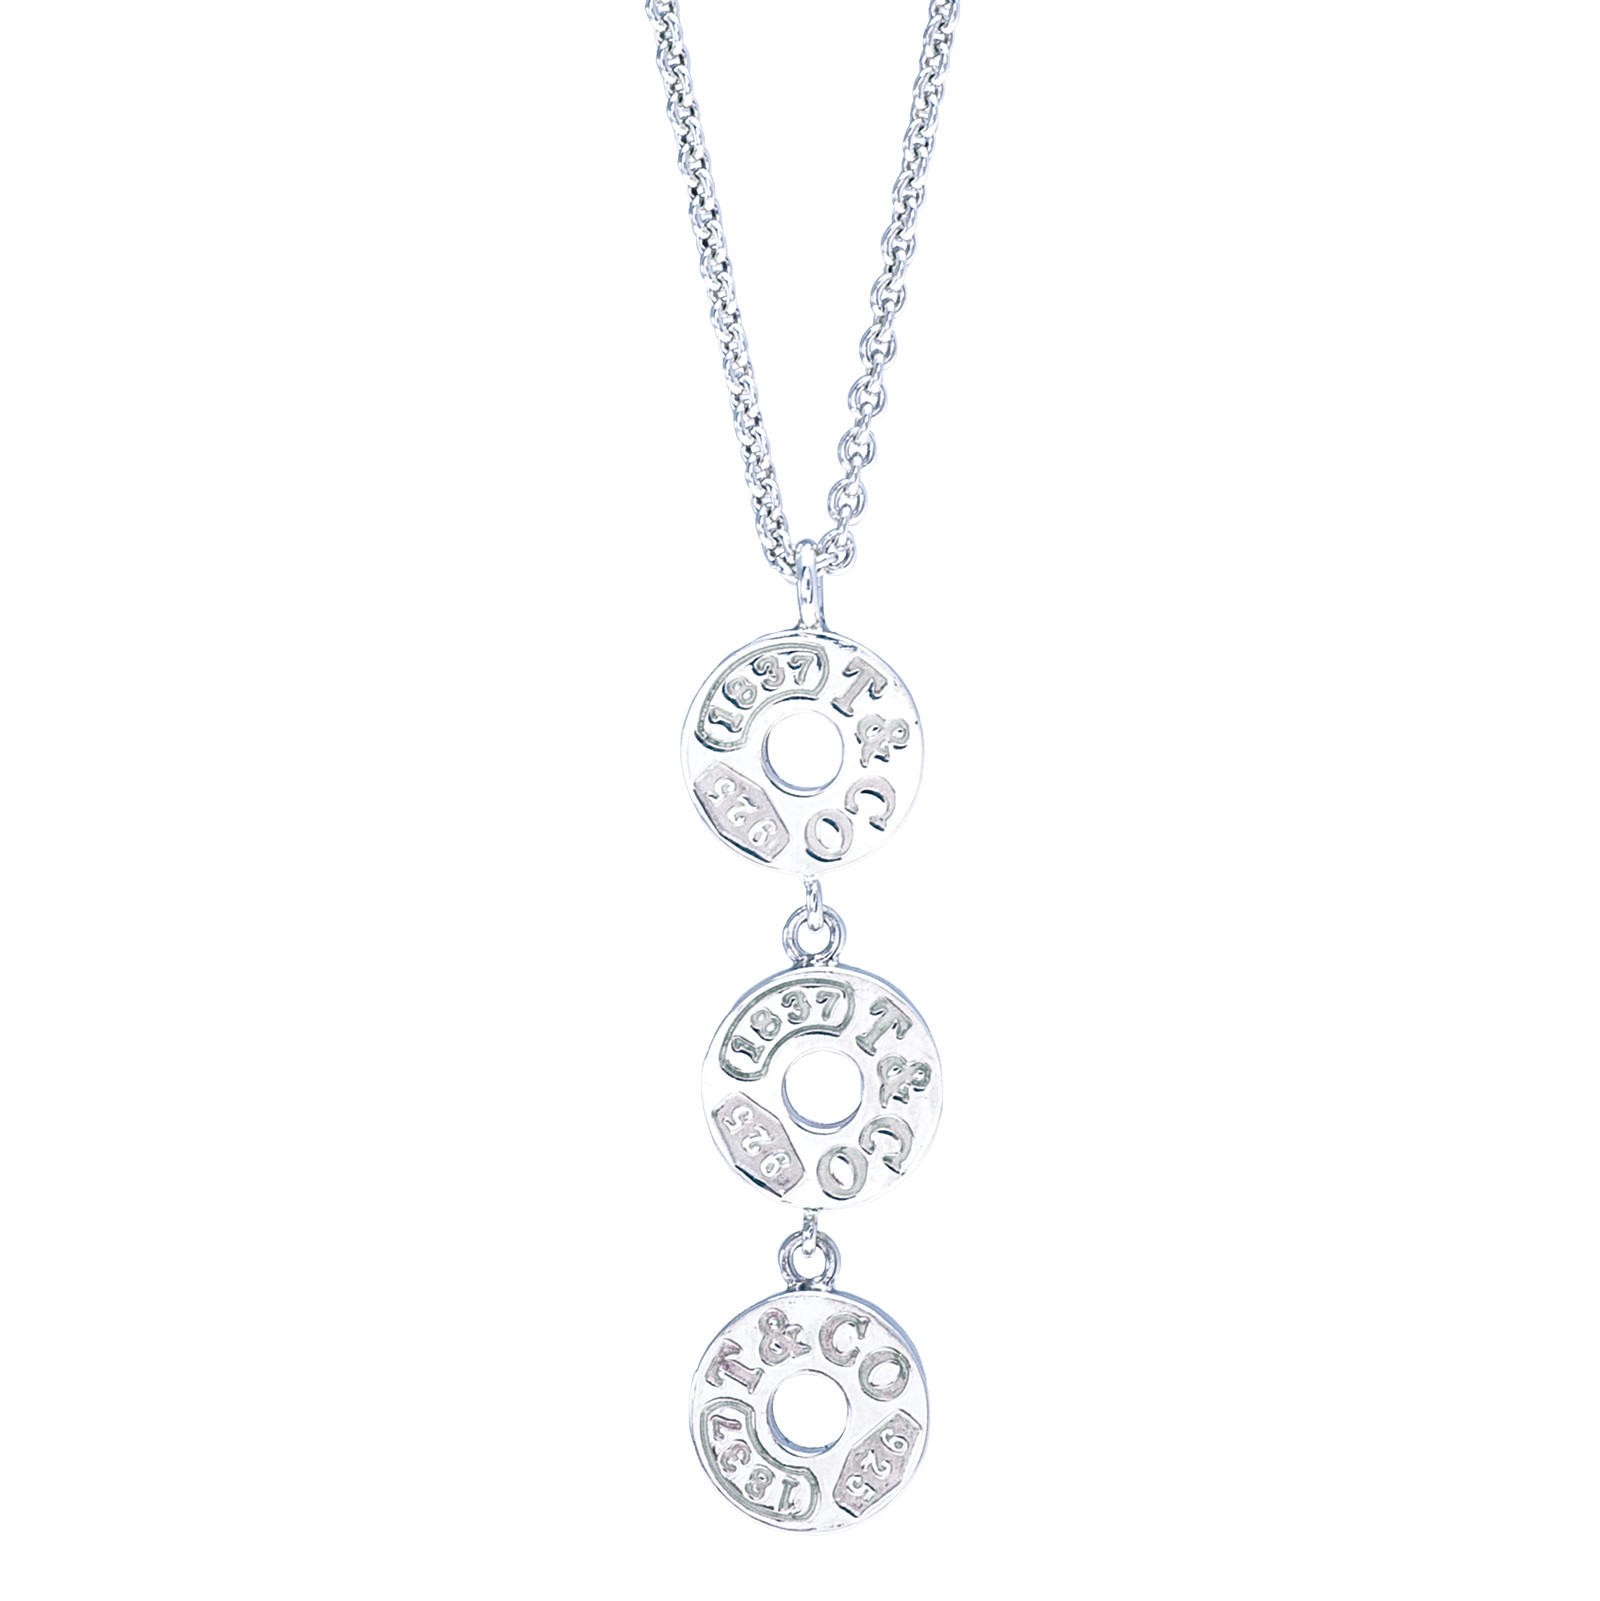 Vintage Tiffany & Co. 1837 Circle Necklace